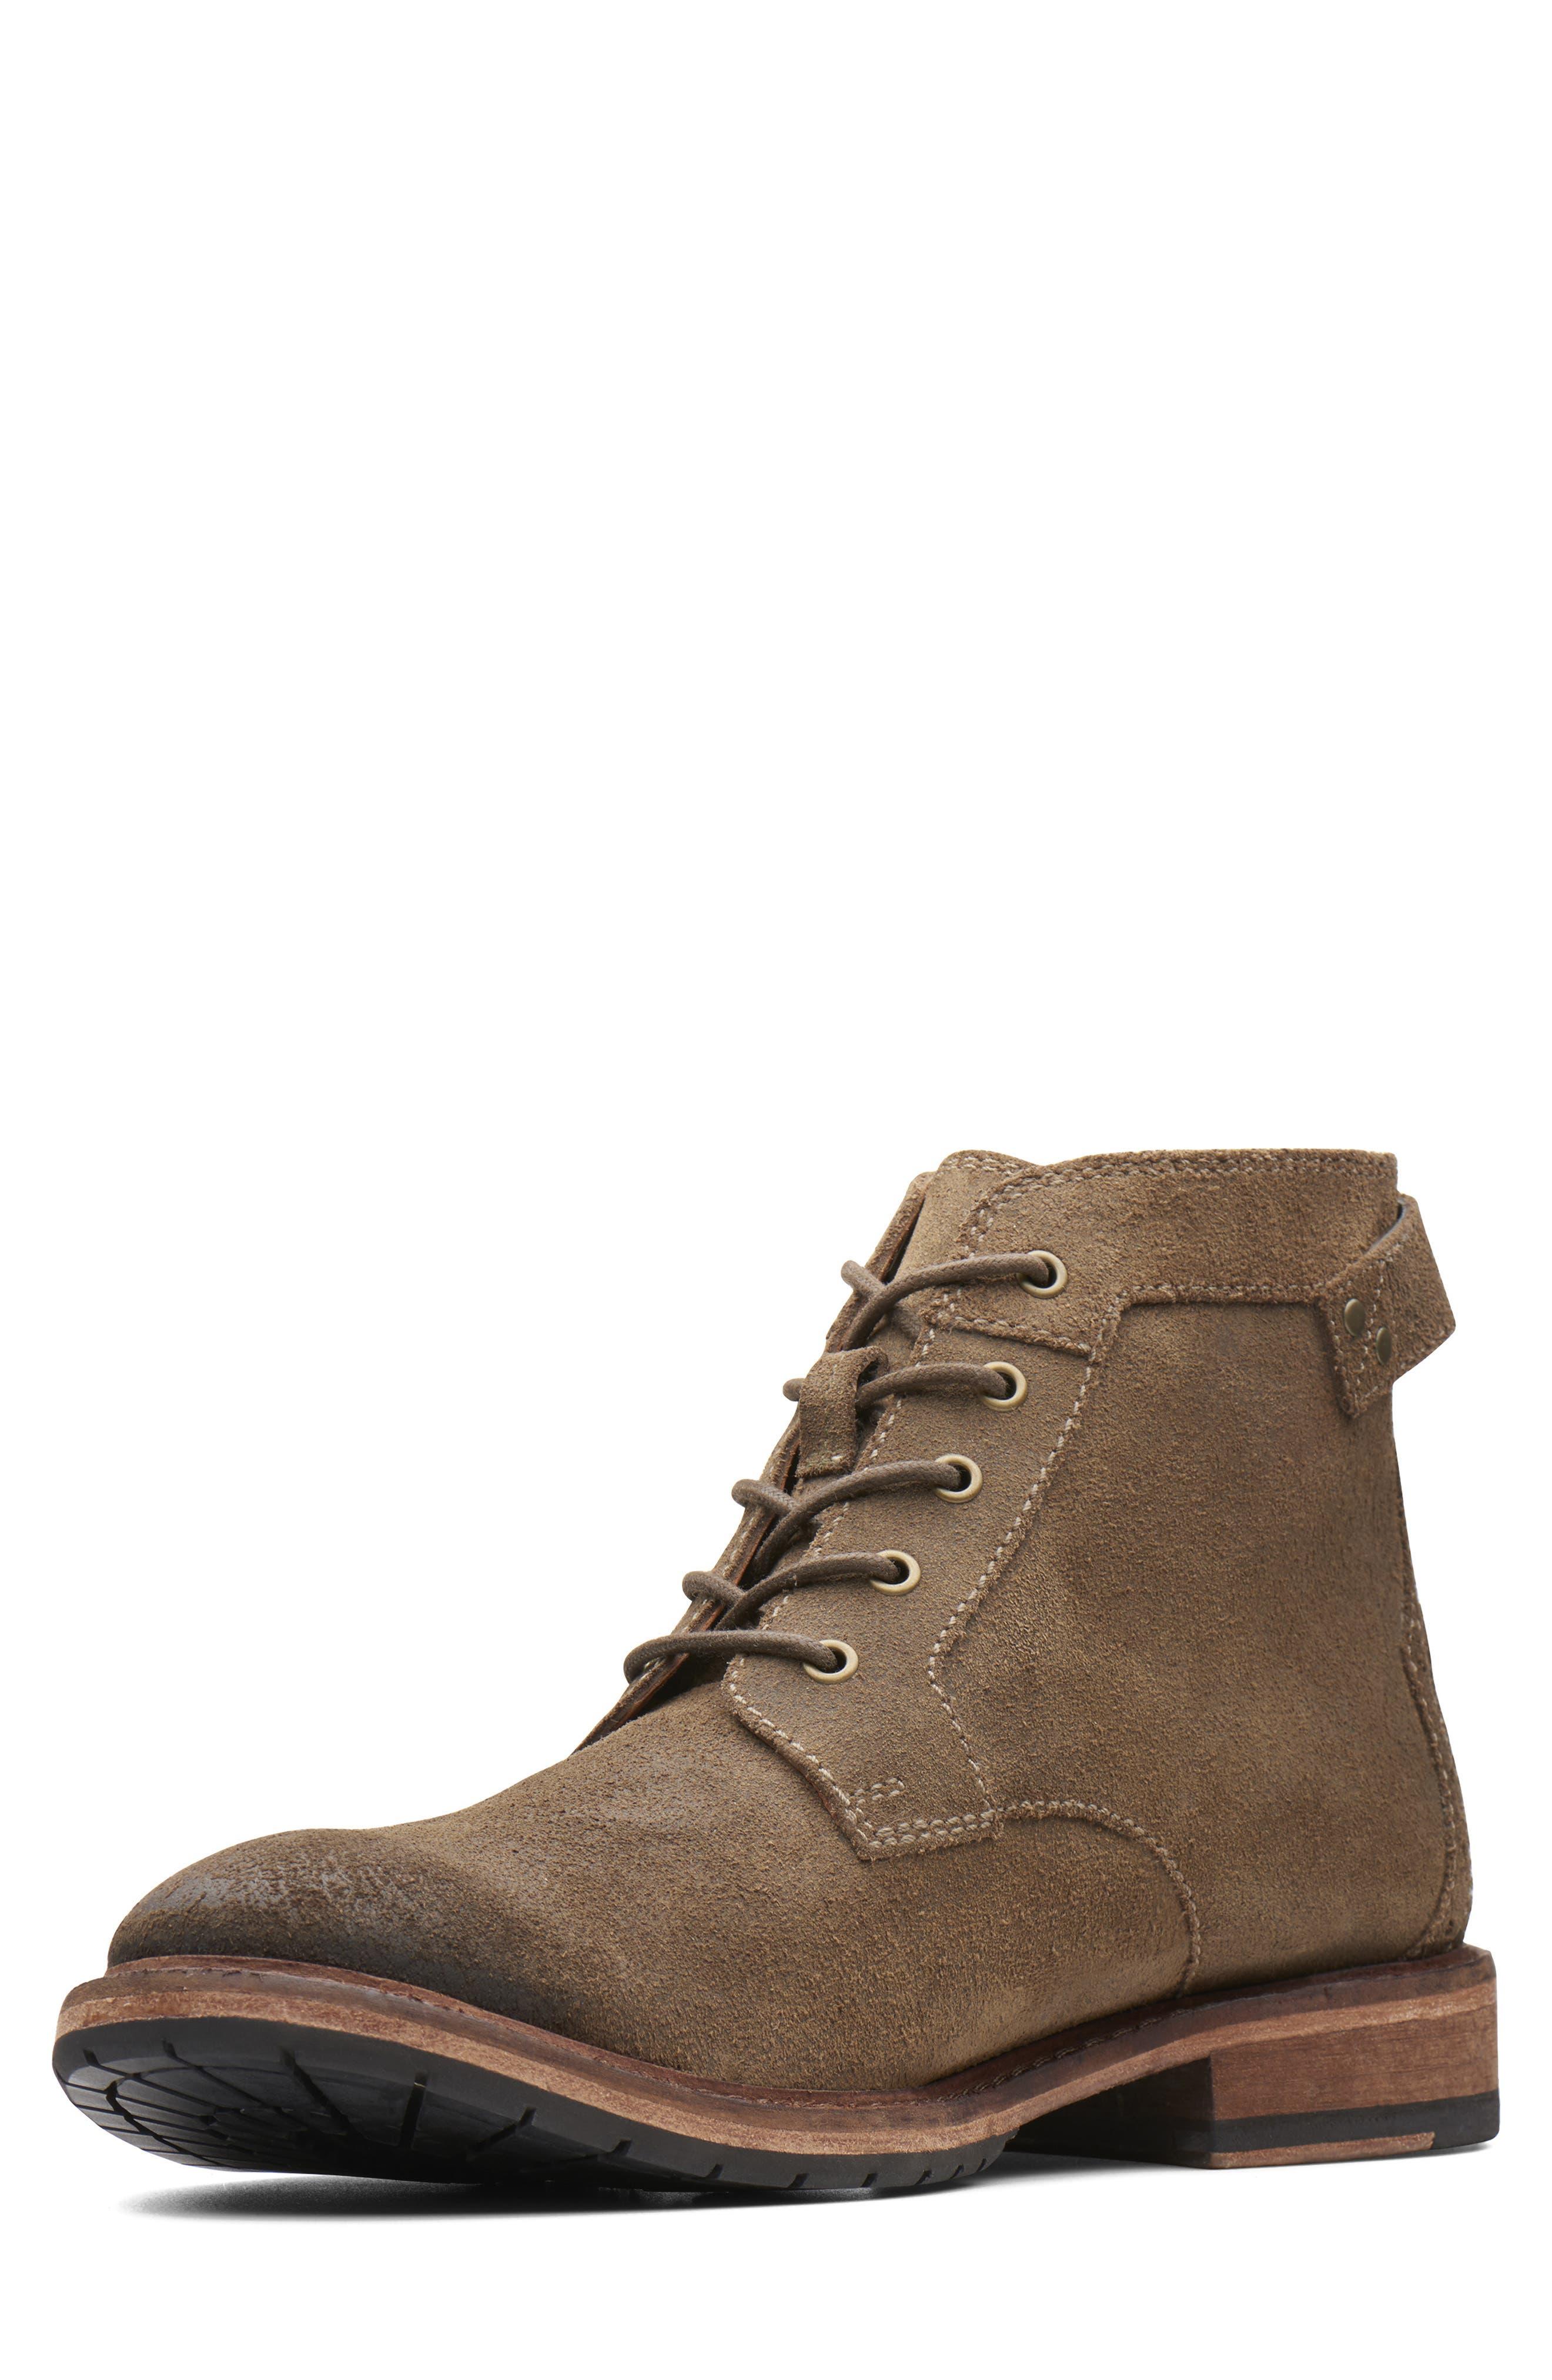 Clarkdale Bud Plain Toe Boot,                             Alternate thumbnail 6, color,                             KHAKI SUEDE